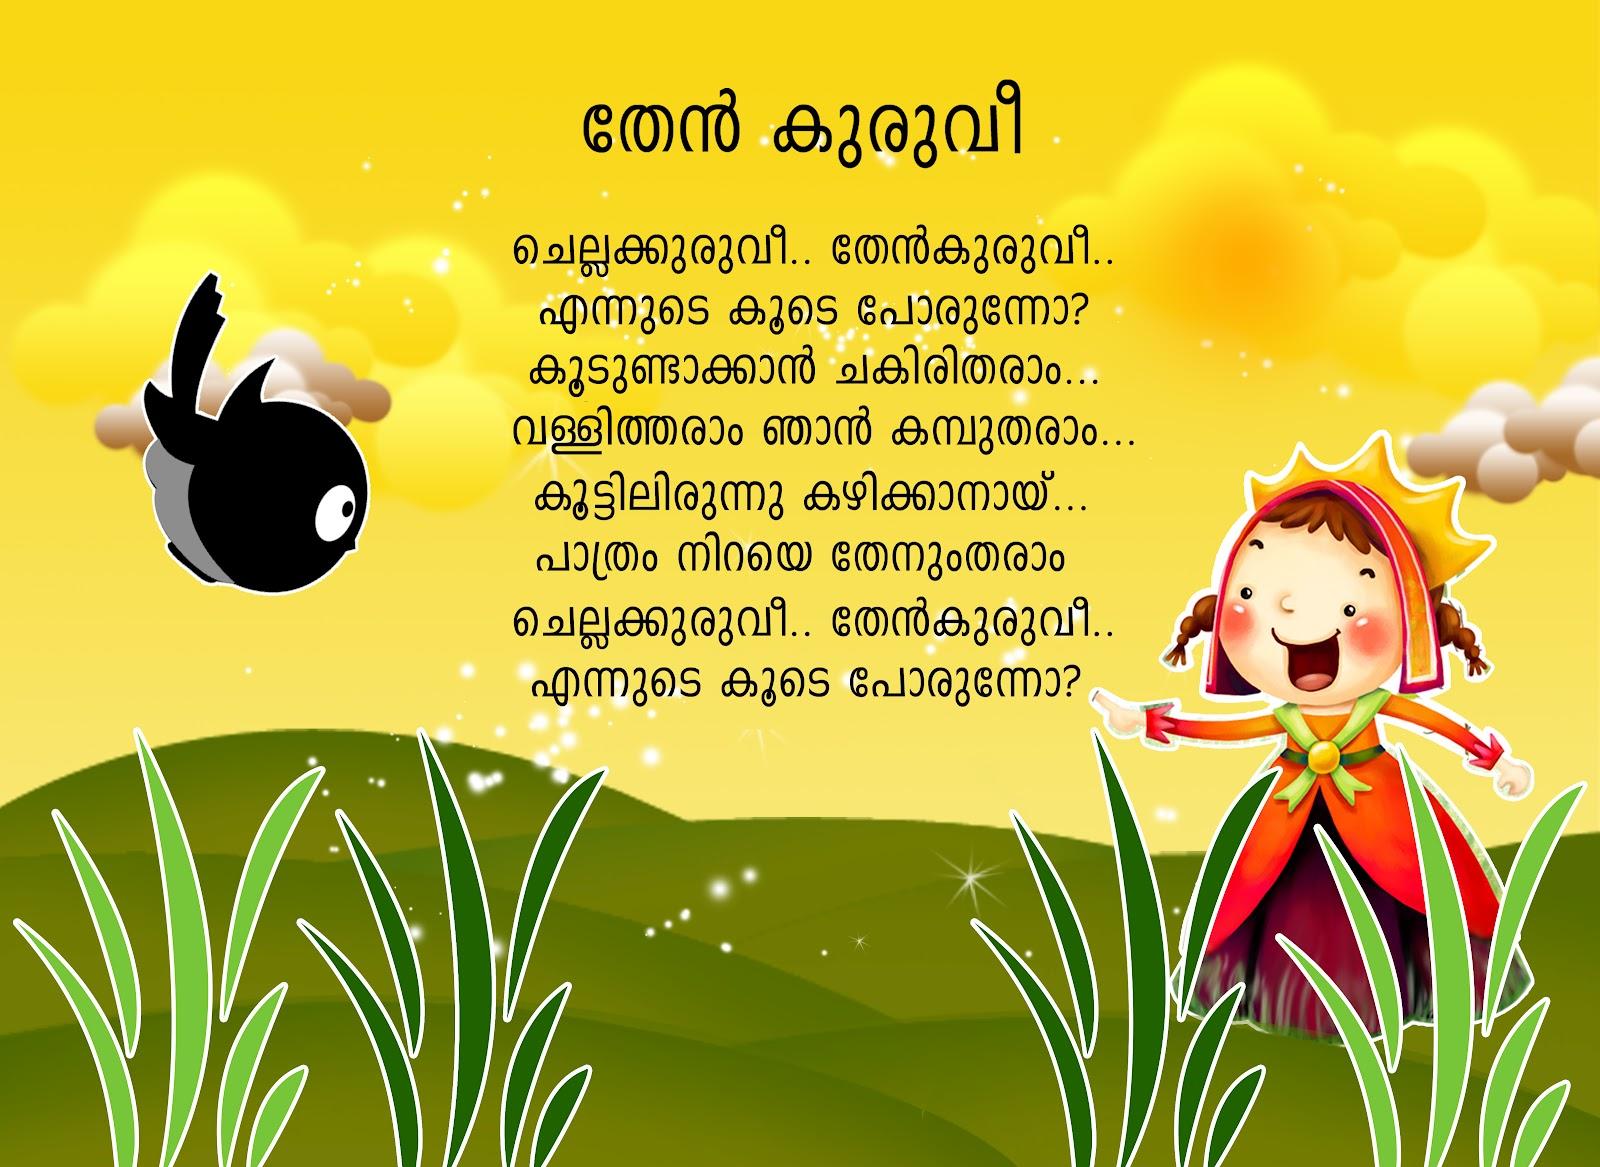 indian national pledge in malayalam pdf